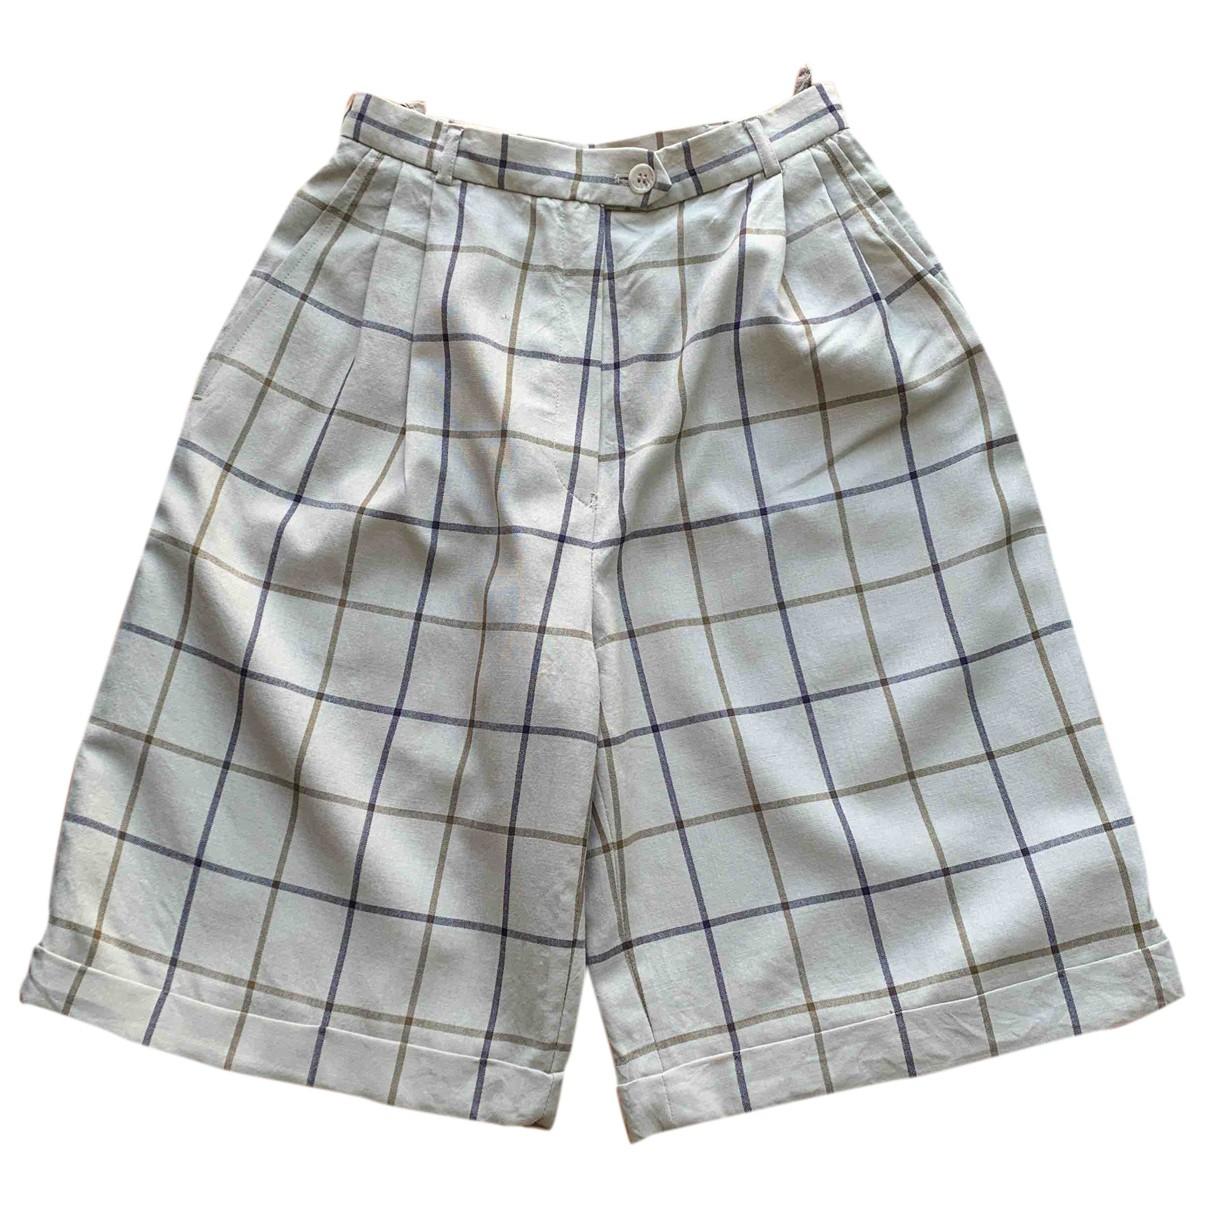 Burberry \N Shorts in  Grau Wolle